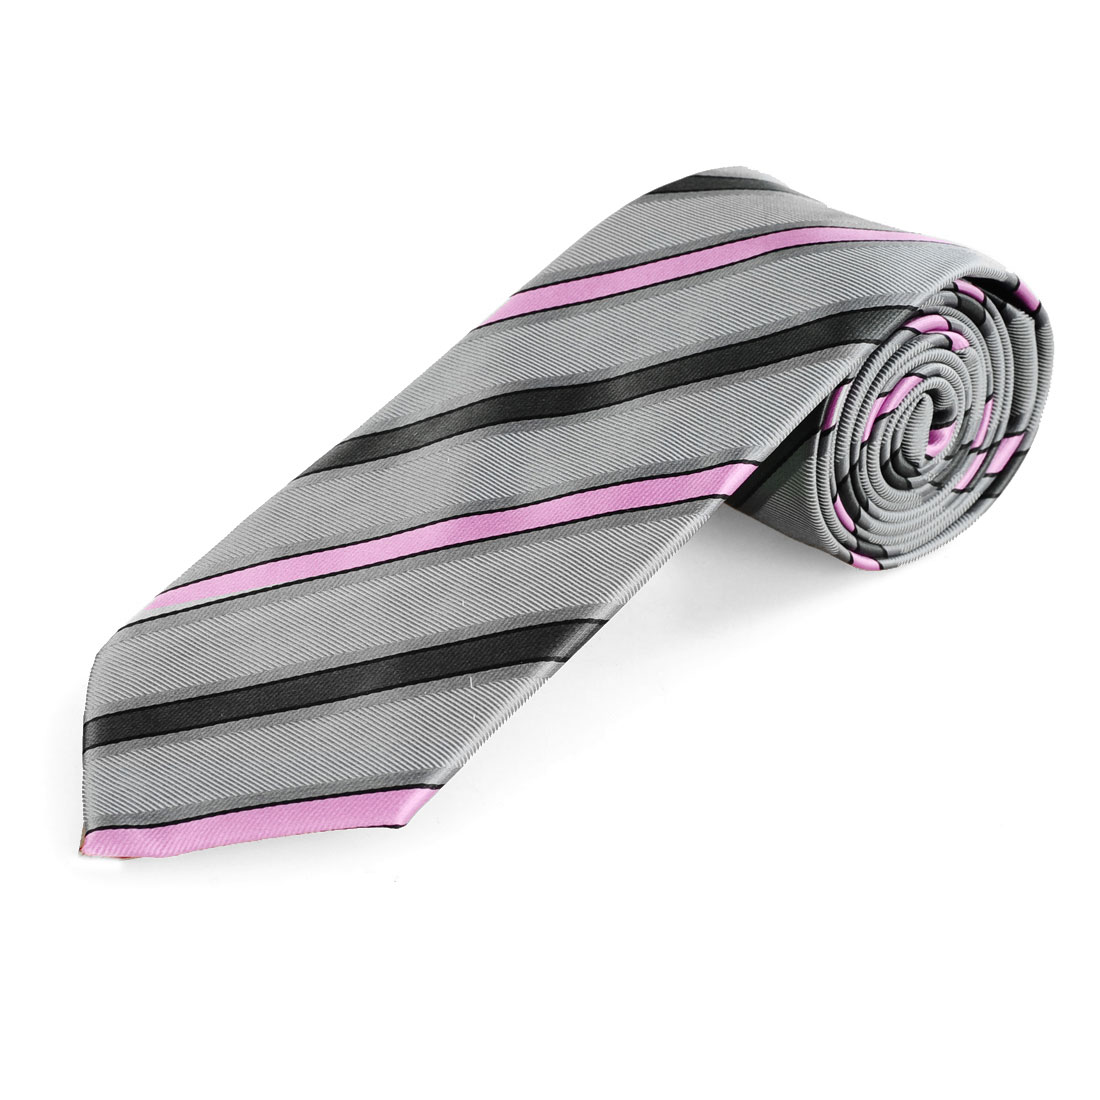 Men Gray Pink Jacquard Woven Striped Textured Suit Tie Neckwear Necktie